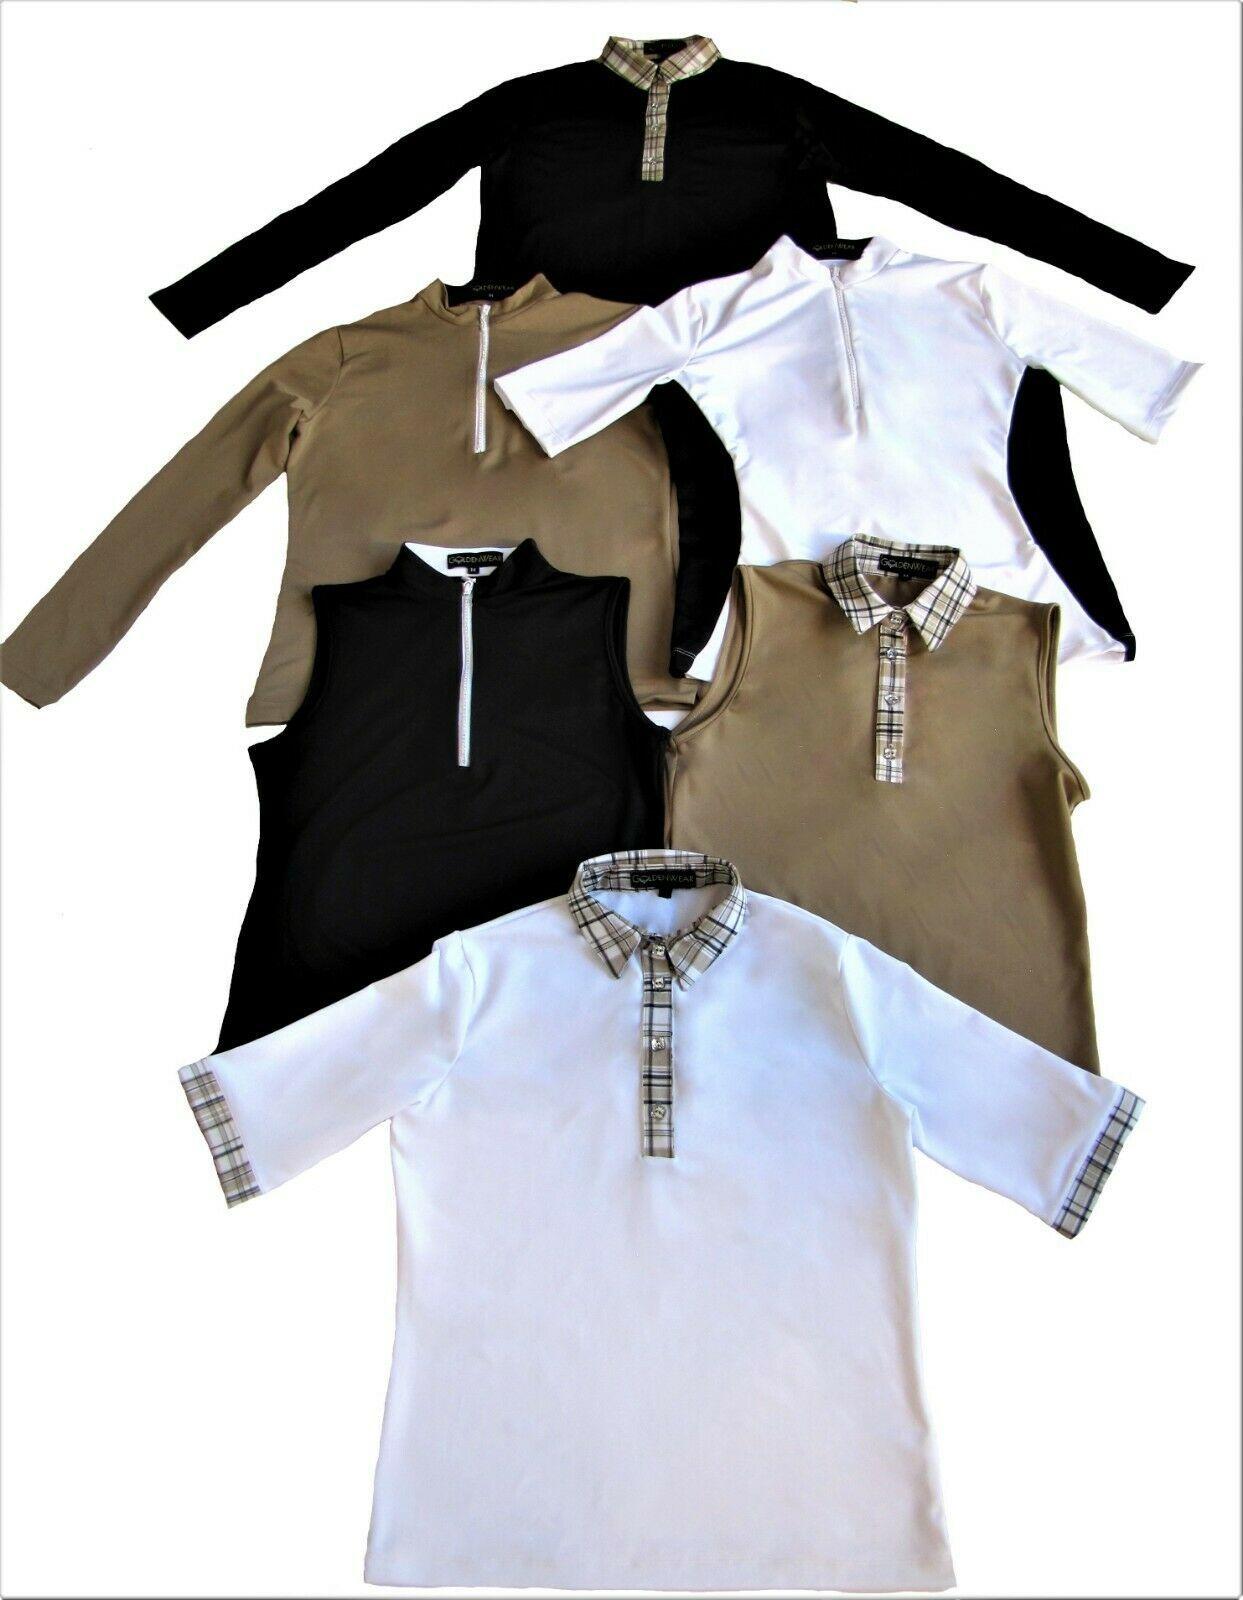 Stylish Women's Golf & Casual Tan Short Sleeve Mock Polo, Rhinestone Zipper  image 2